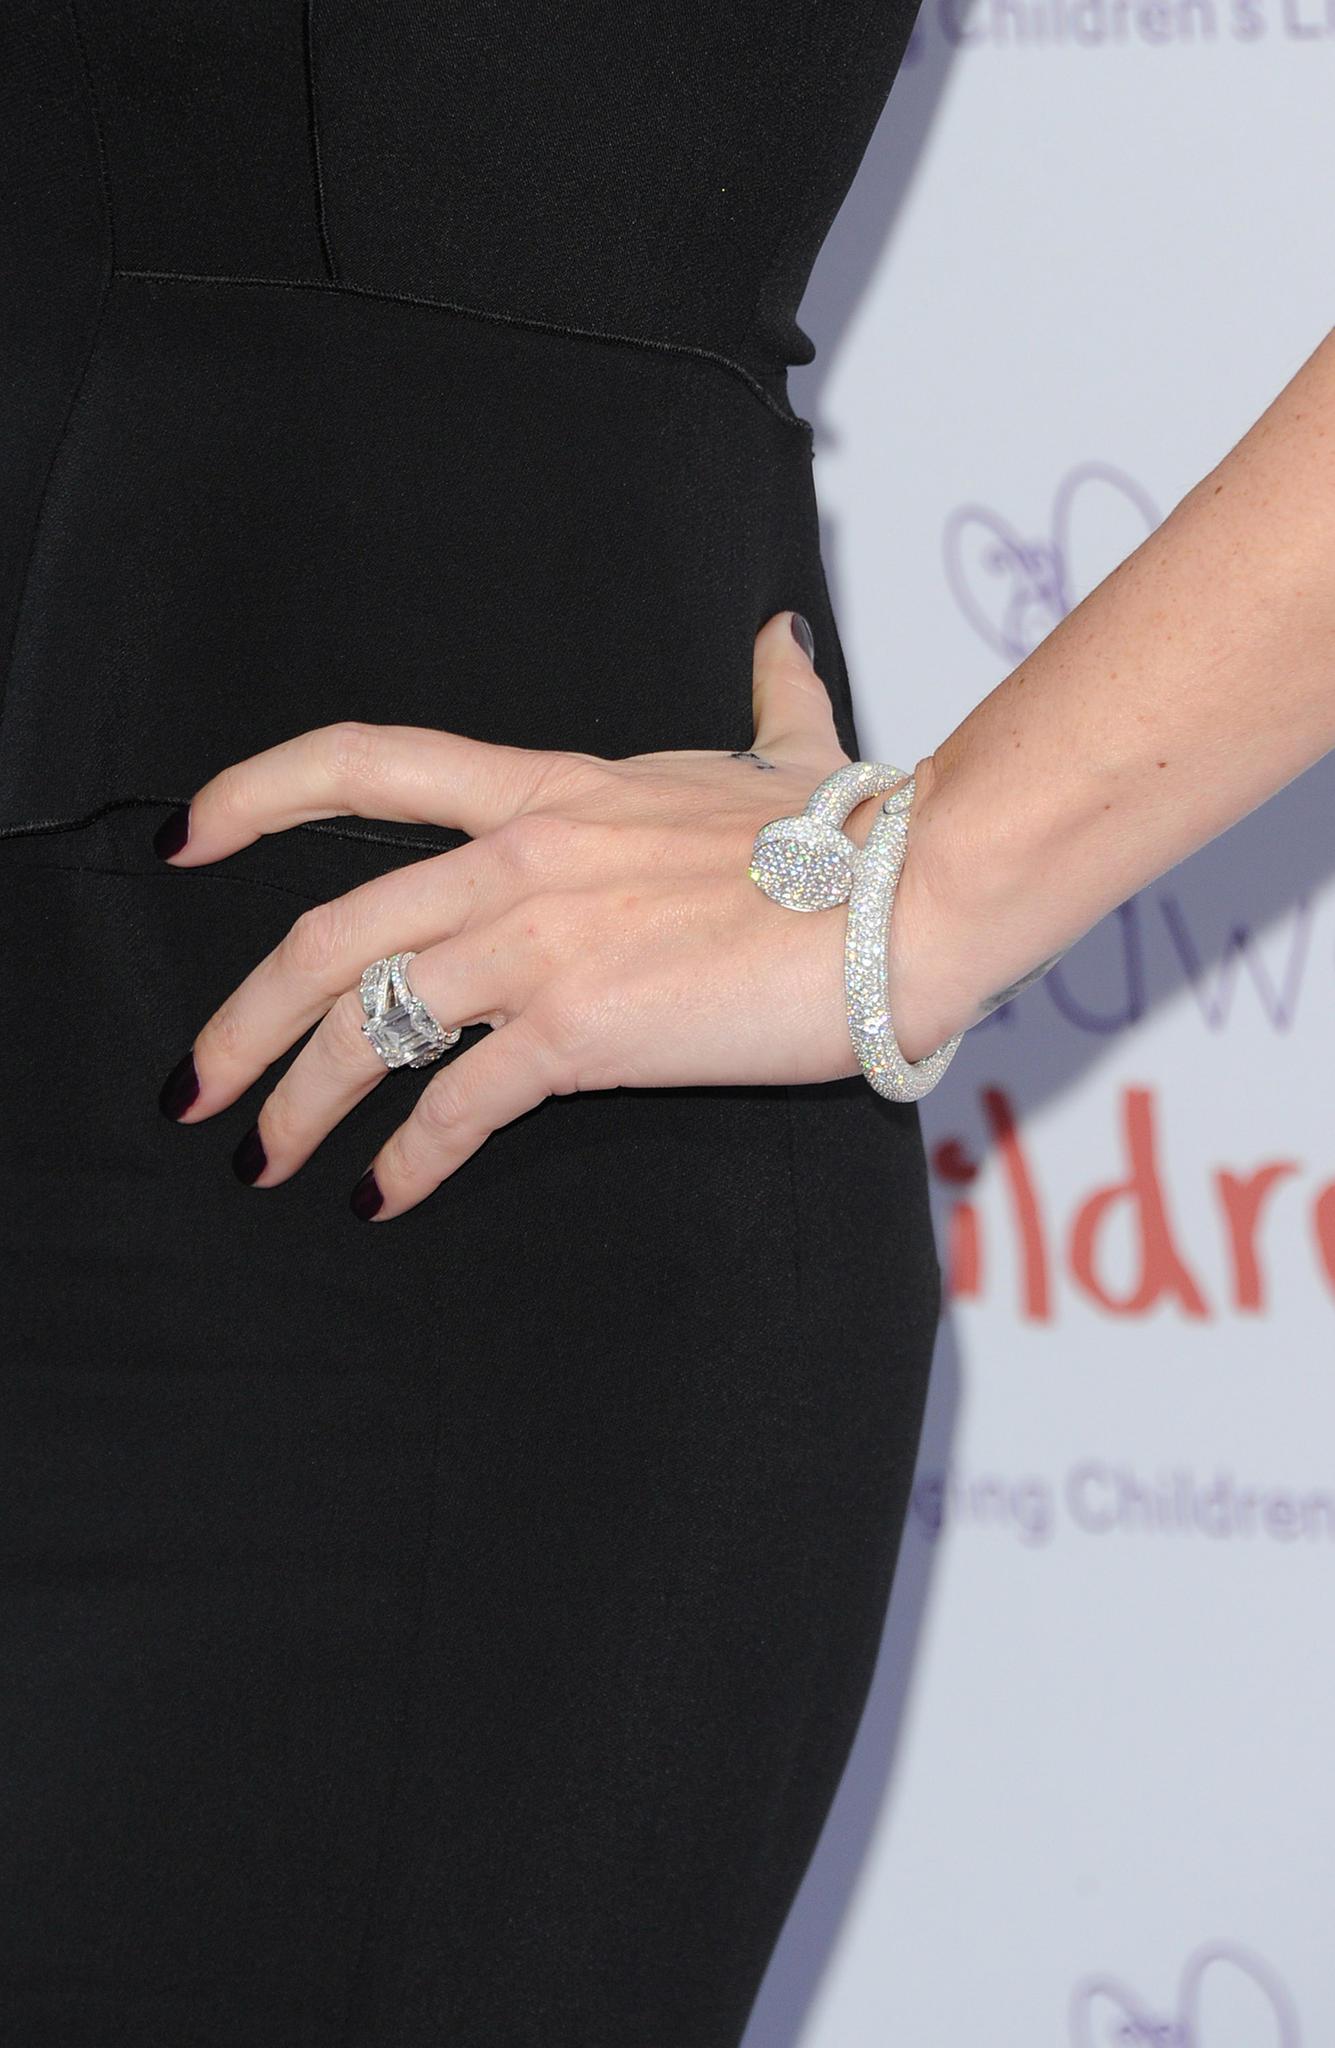 Tamara Ecclestone mit ihrem 95.000 Euro teuren Diamantarmreif von Cartier.